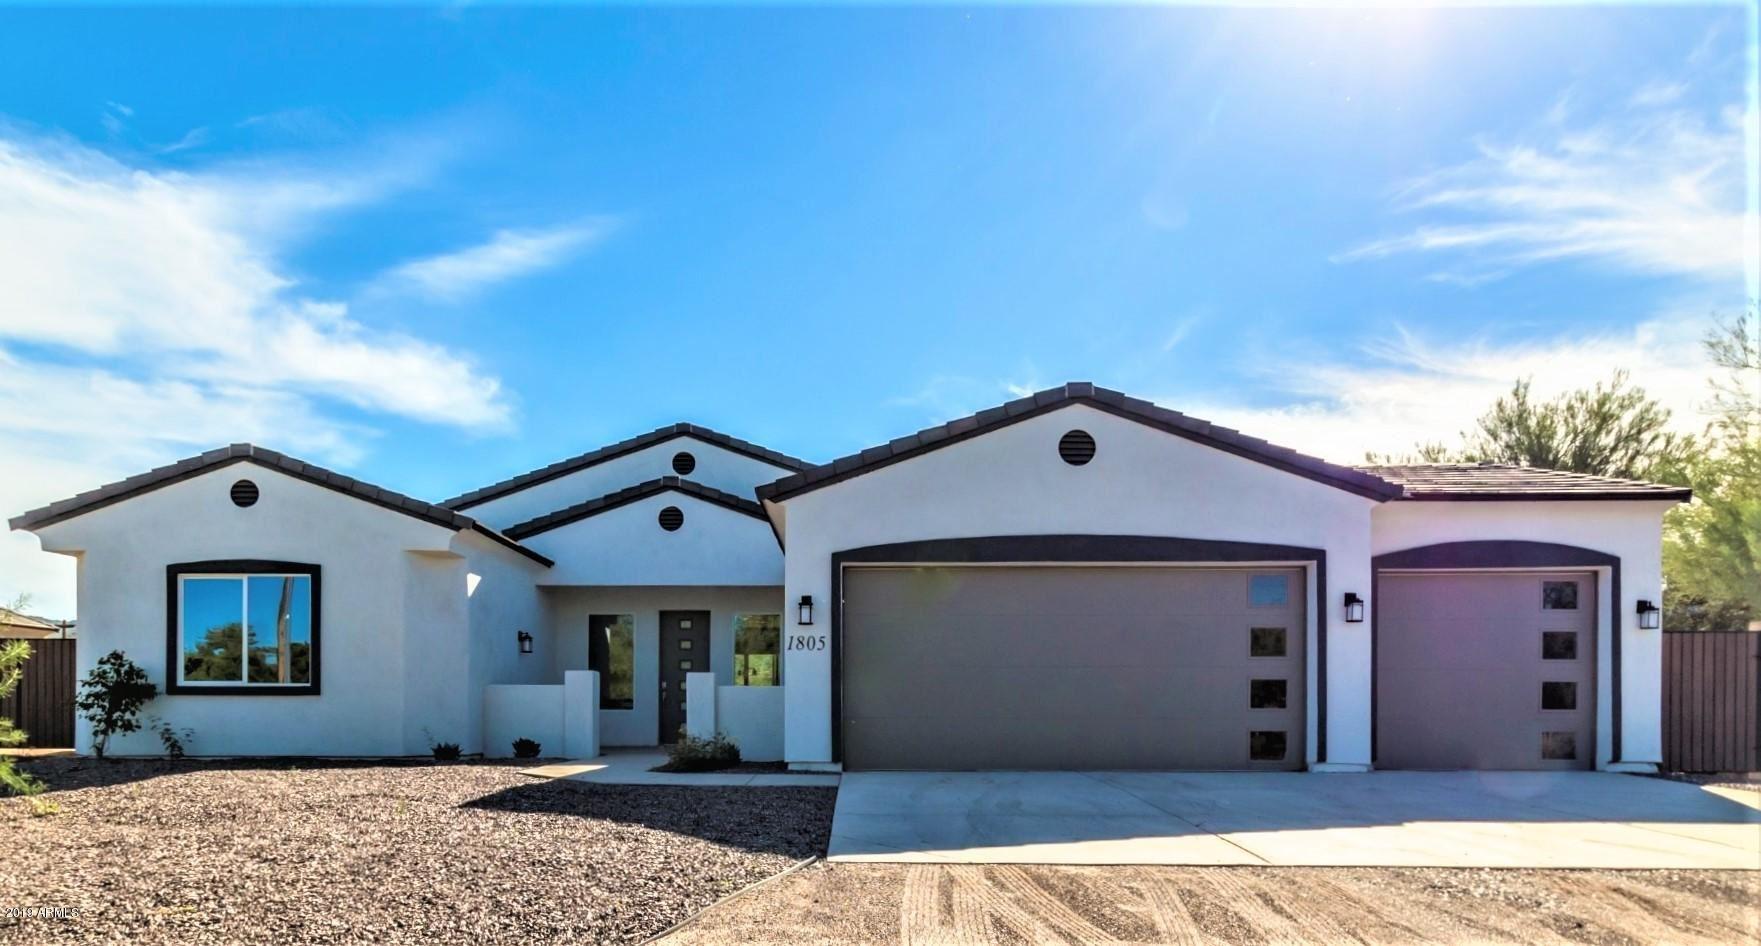 2847 W ELLIOT Road, Laveen, AZ 85339 - MLS#: 6135174